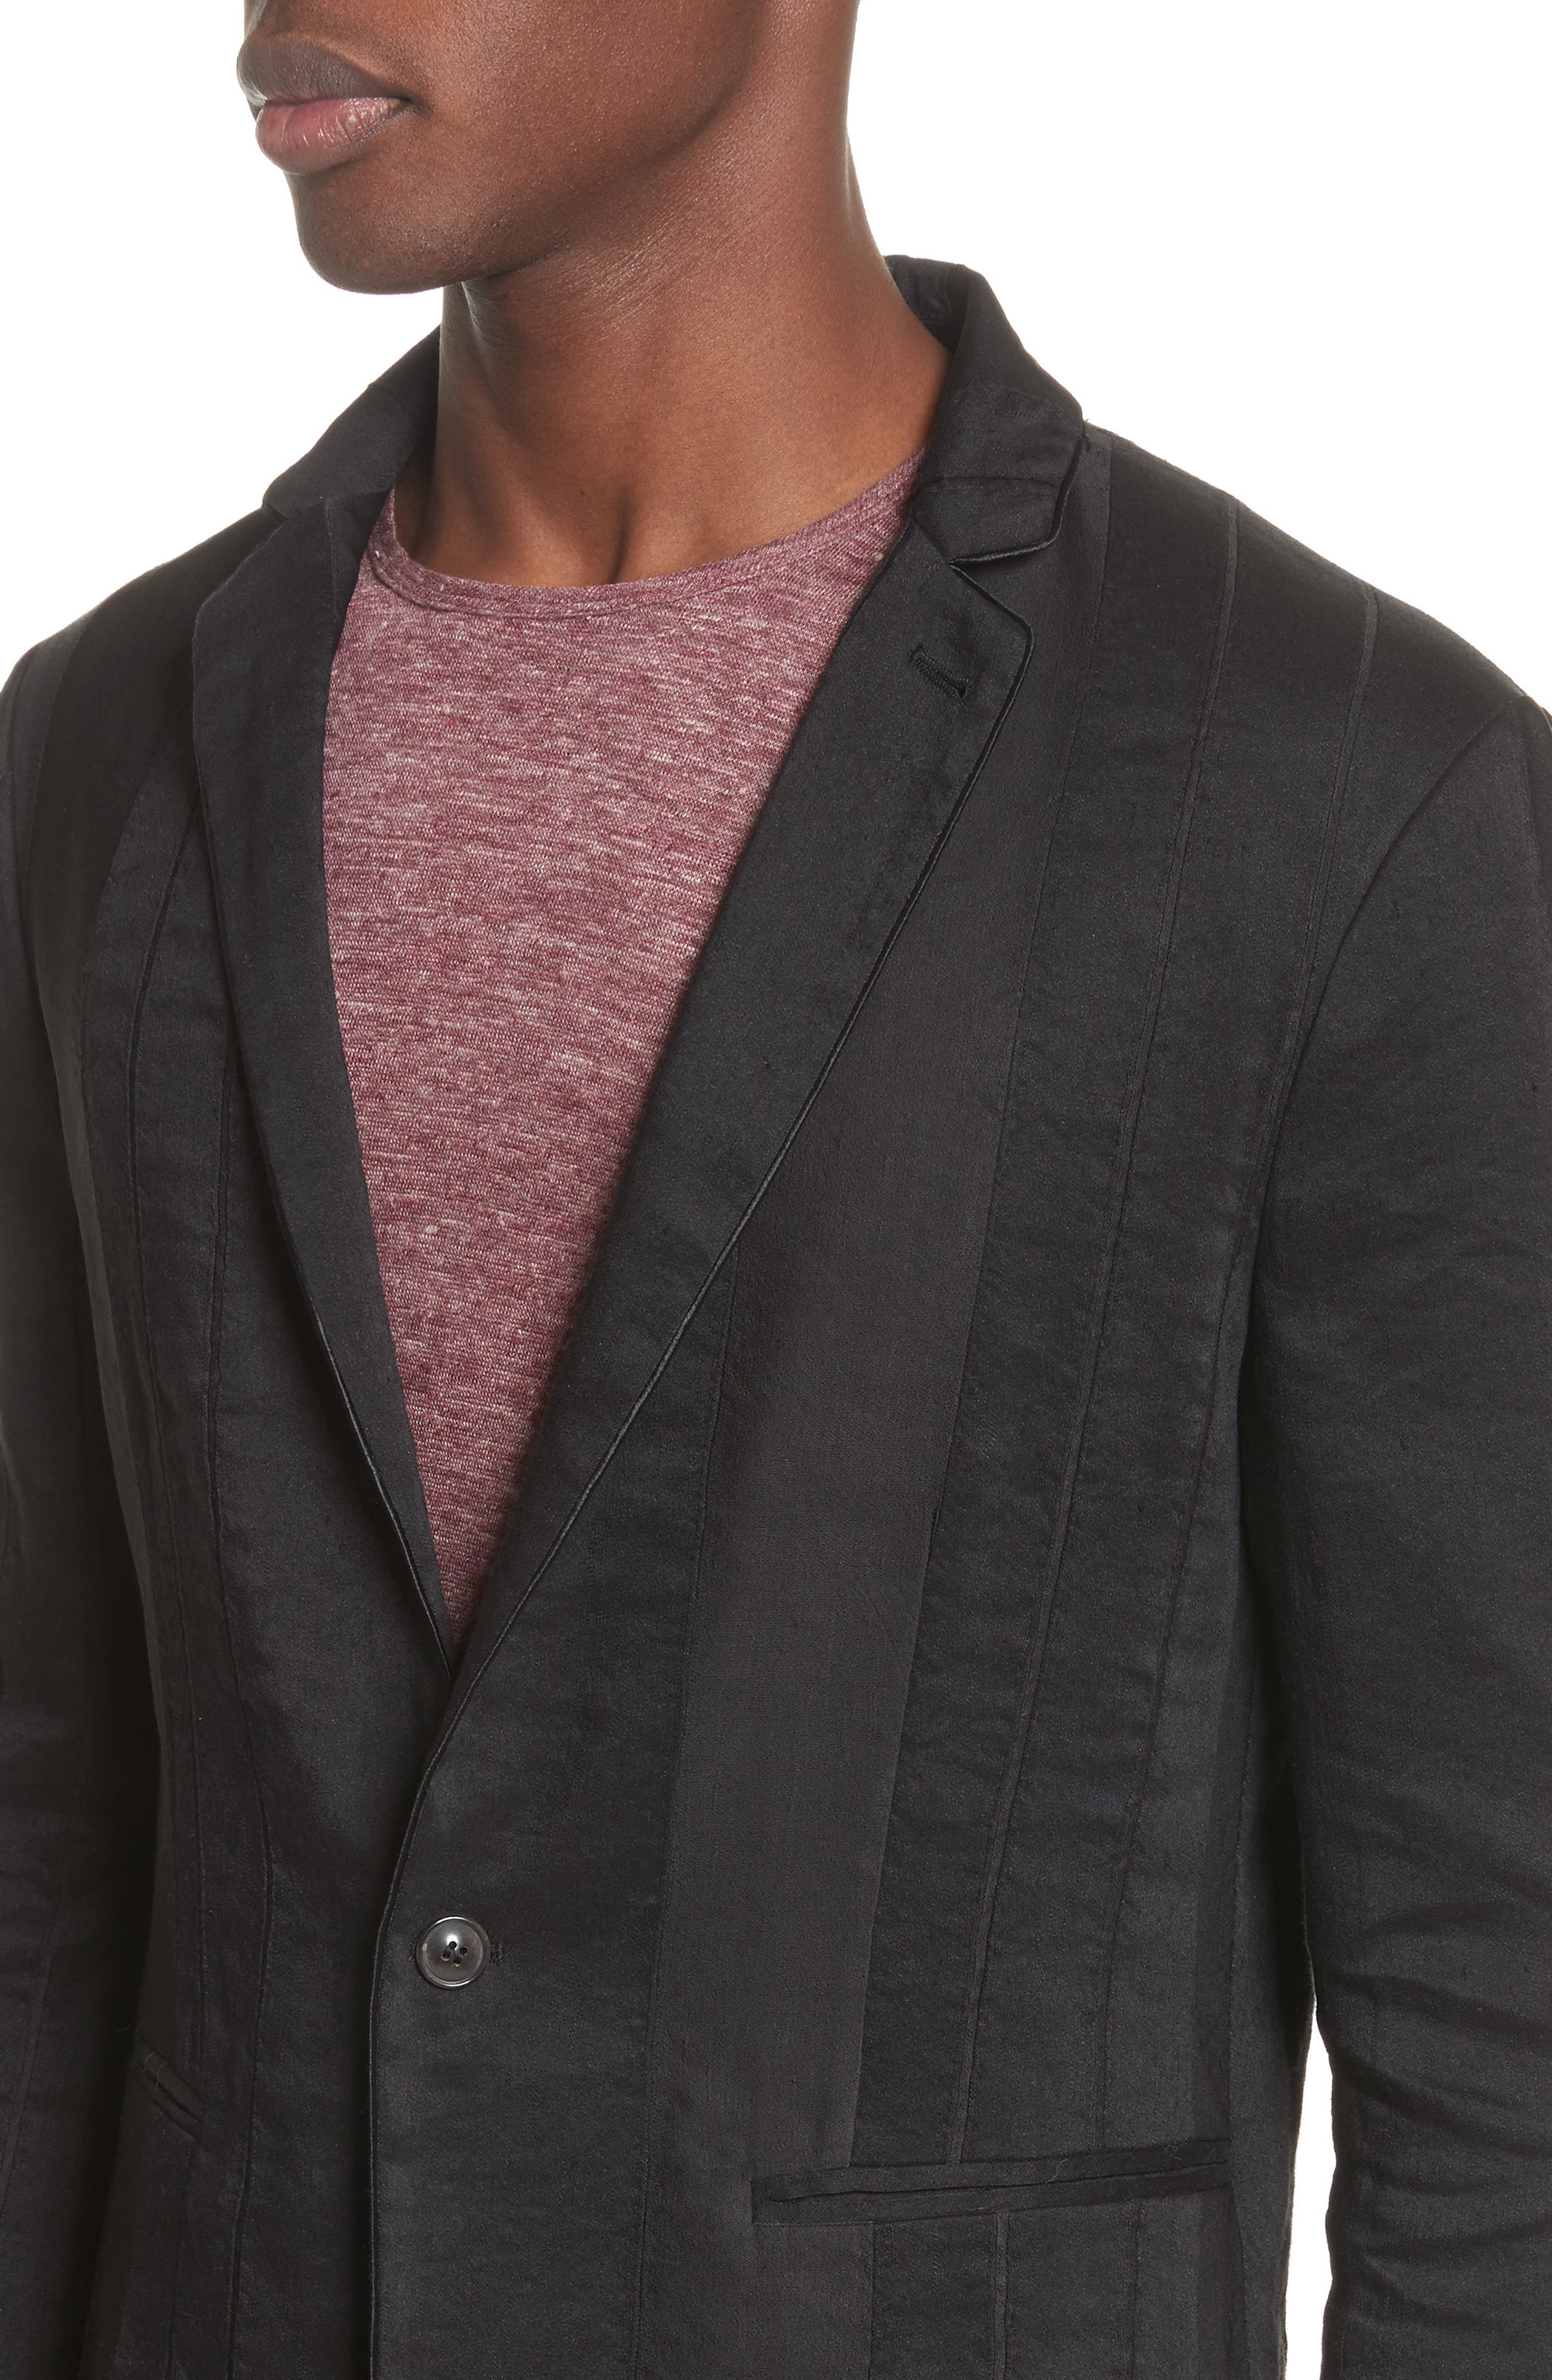 Slim Fit Linen Blend Blazer,                             Alternate thumbnail 4, color,                             BLACK